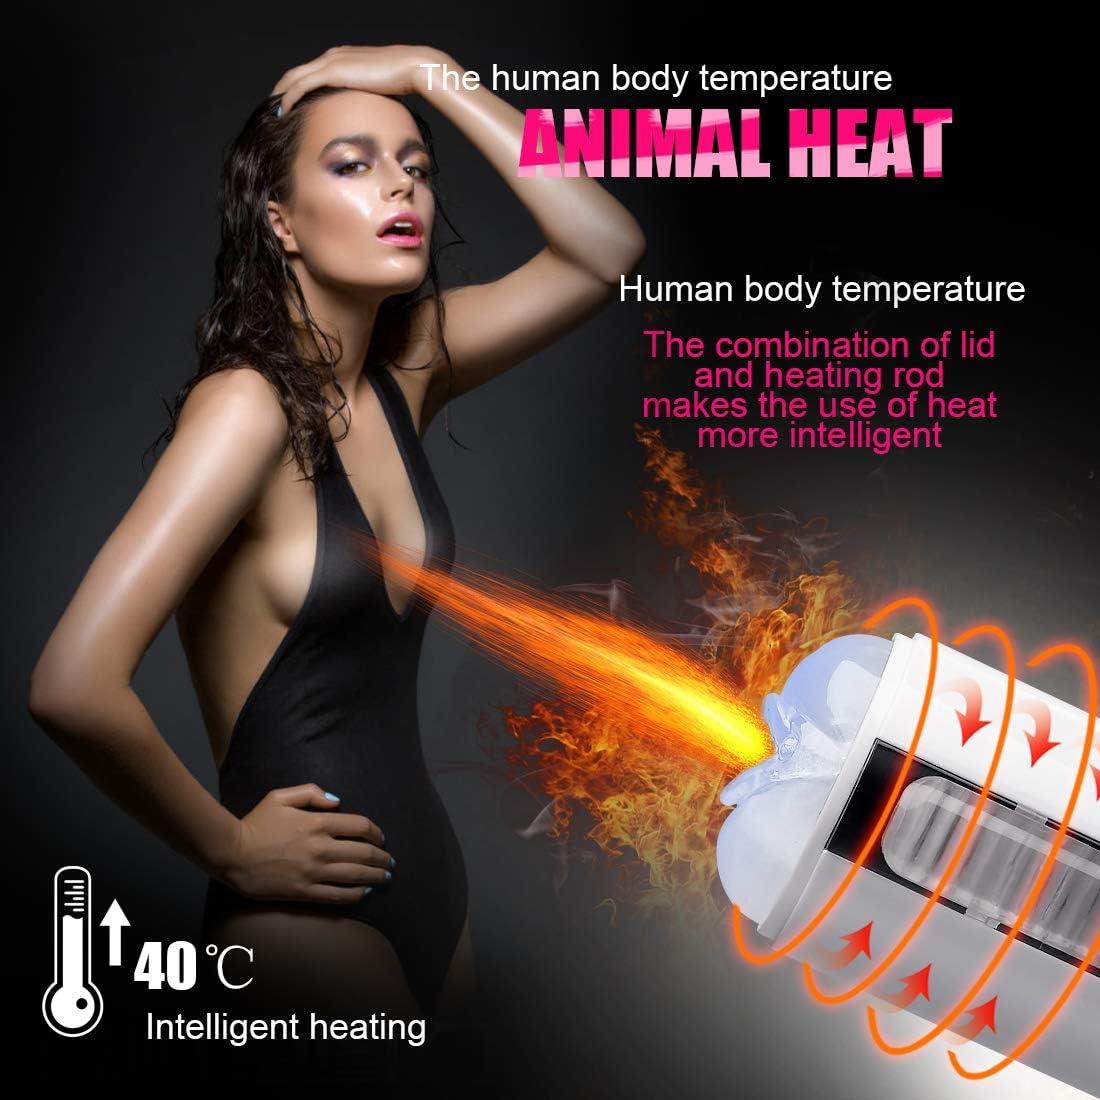 white Extēndēr Slēēvēs For Men With Heating Voices Suction Base Stroker Pocket Pussey Blowjobsēx Machine Masterbrators For Male intense sucking device